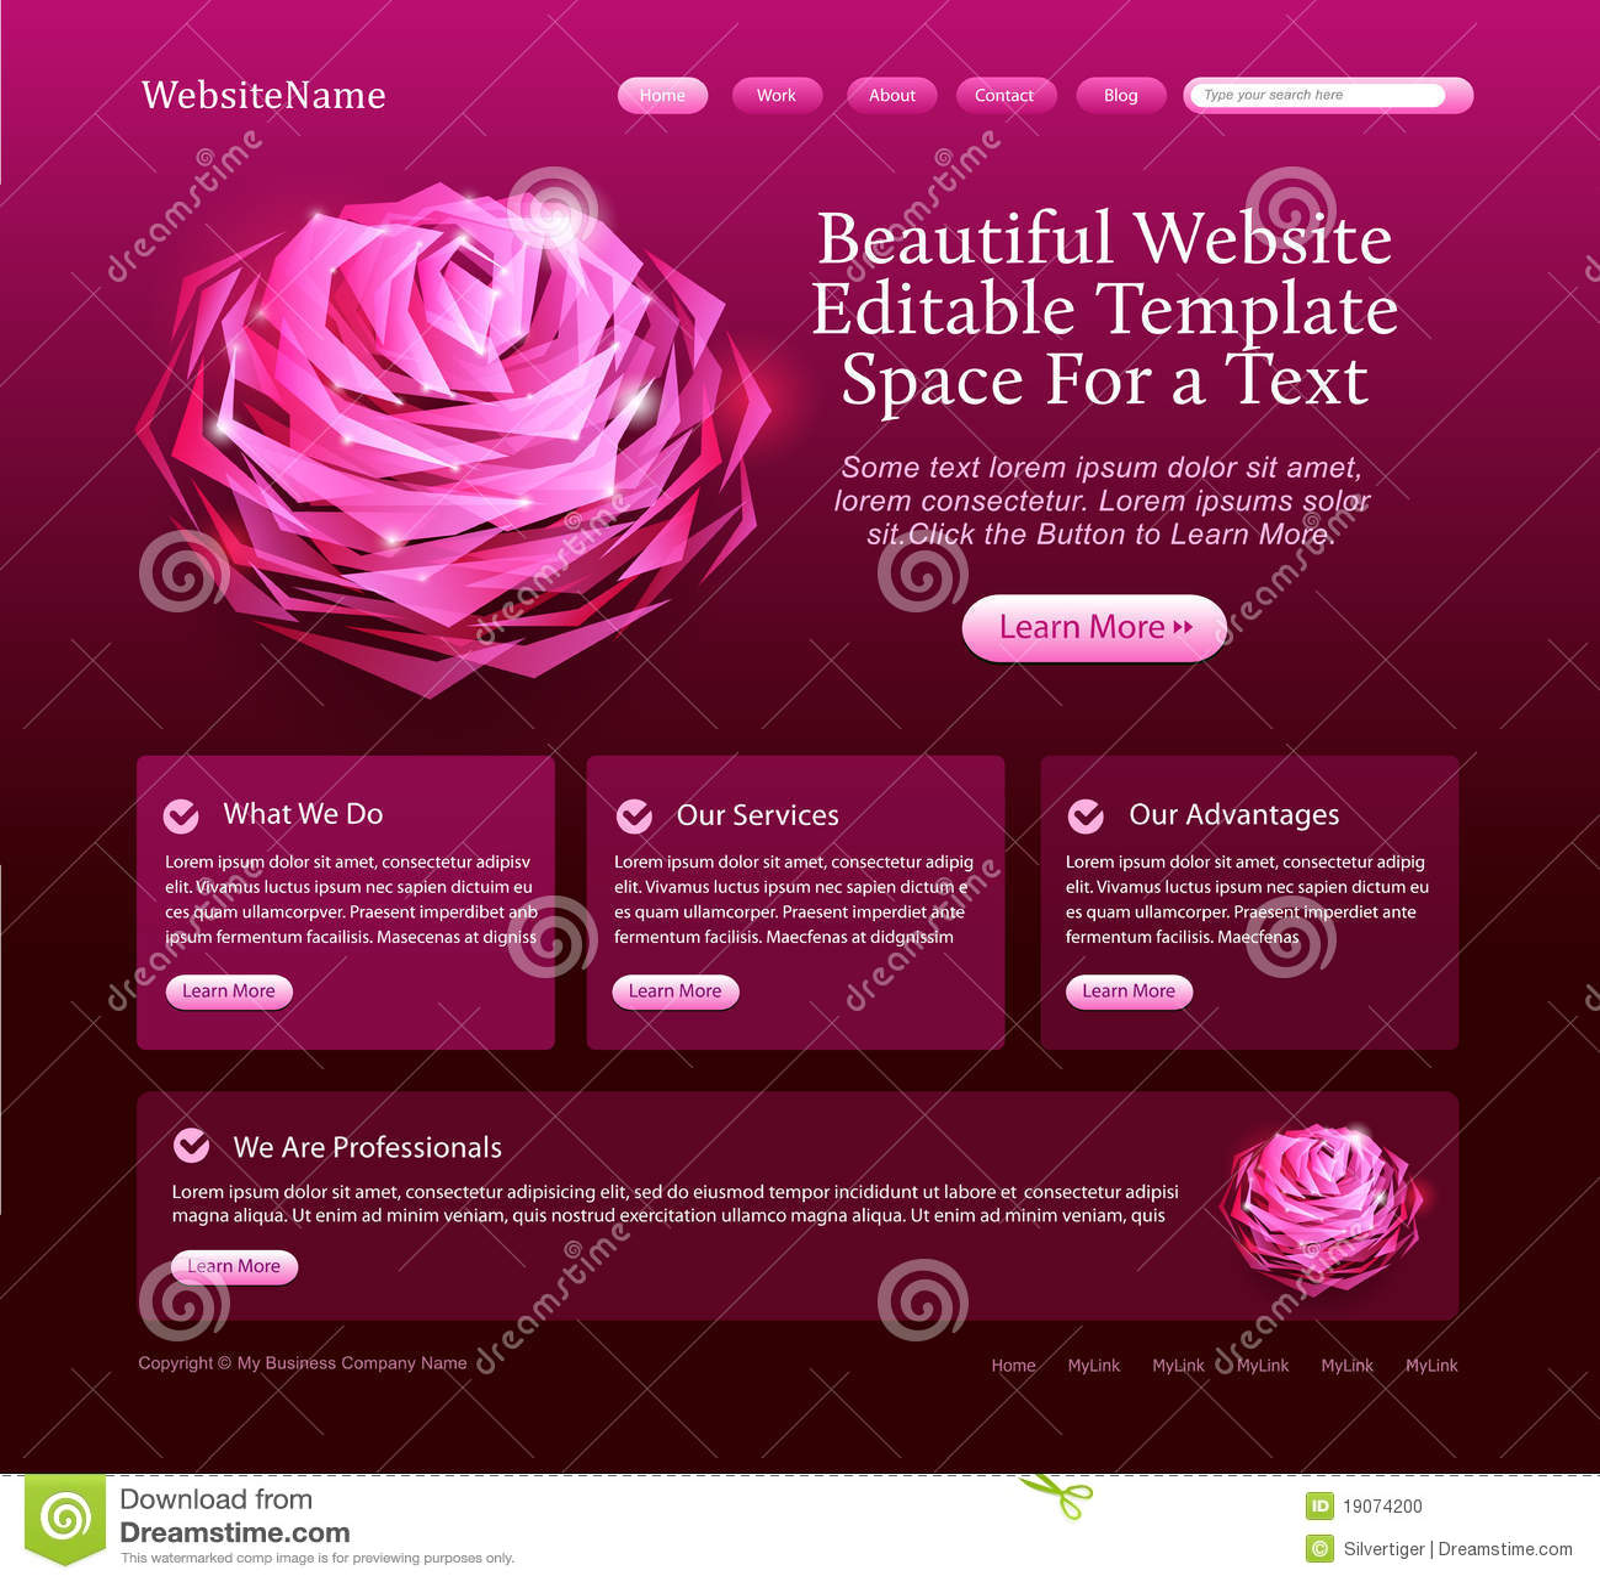 Molde bonito Editable do Web site